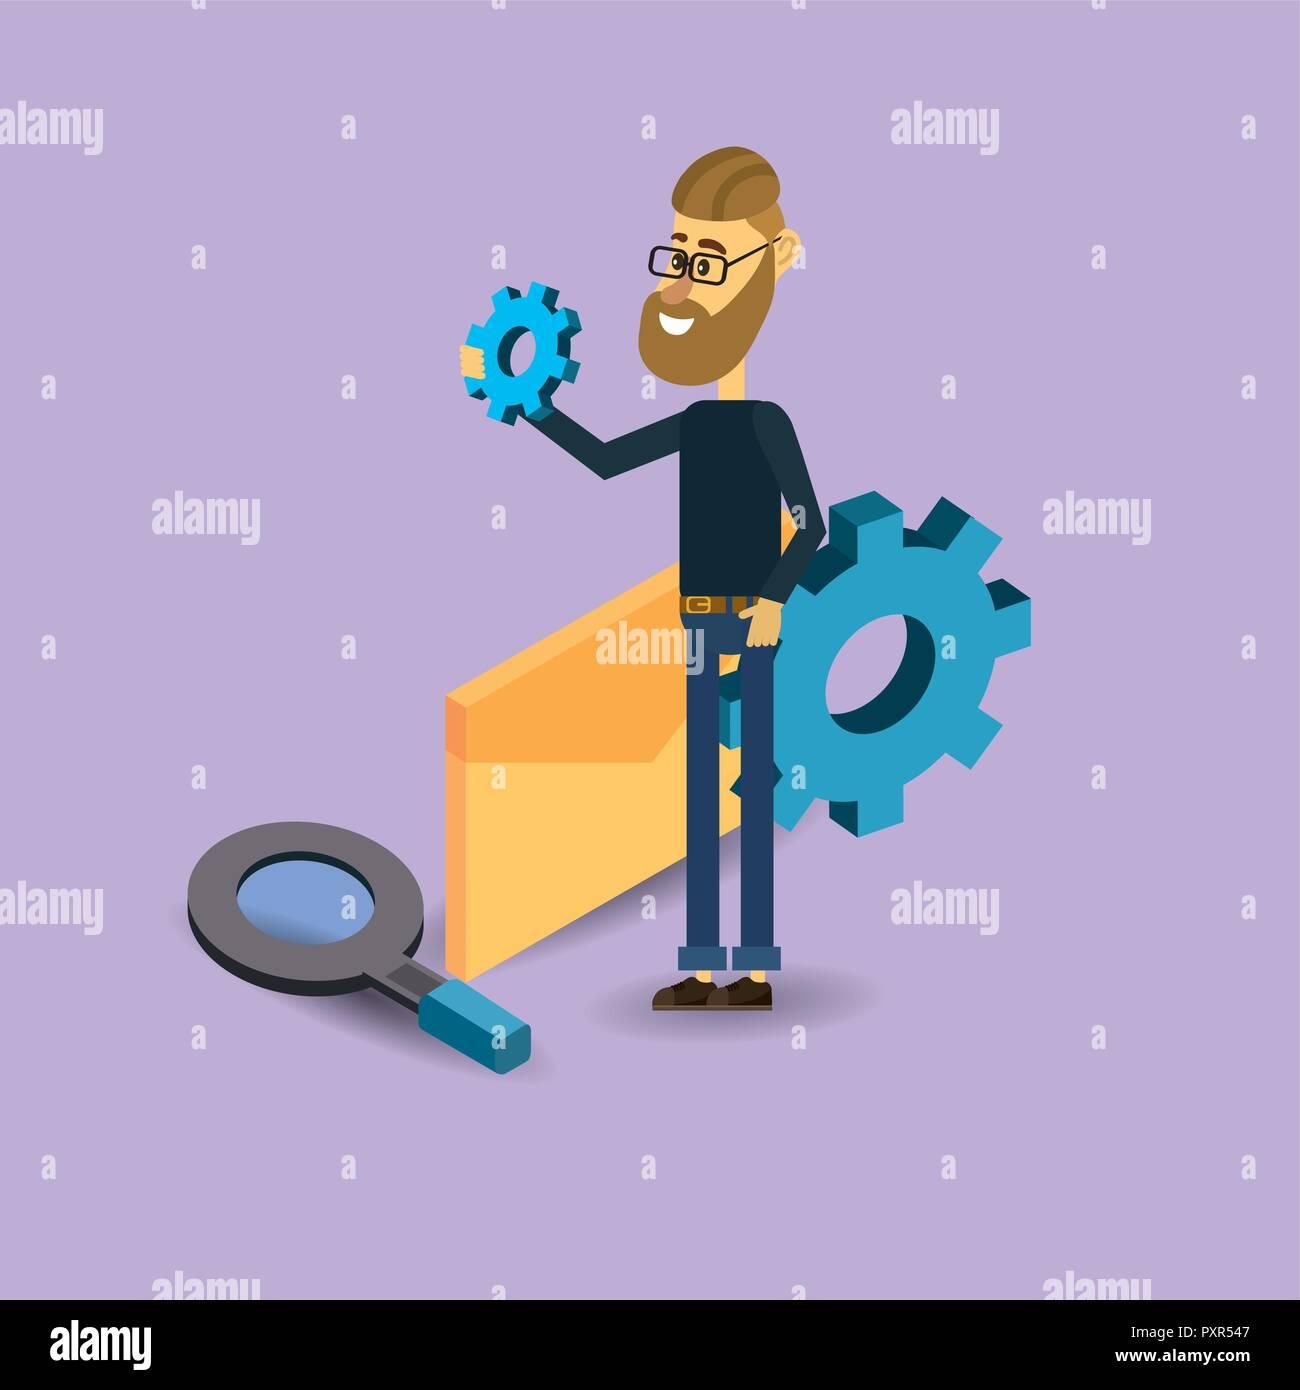 search engine cartoon - Stock Vector